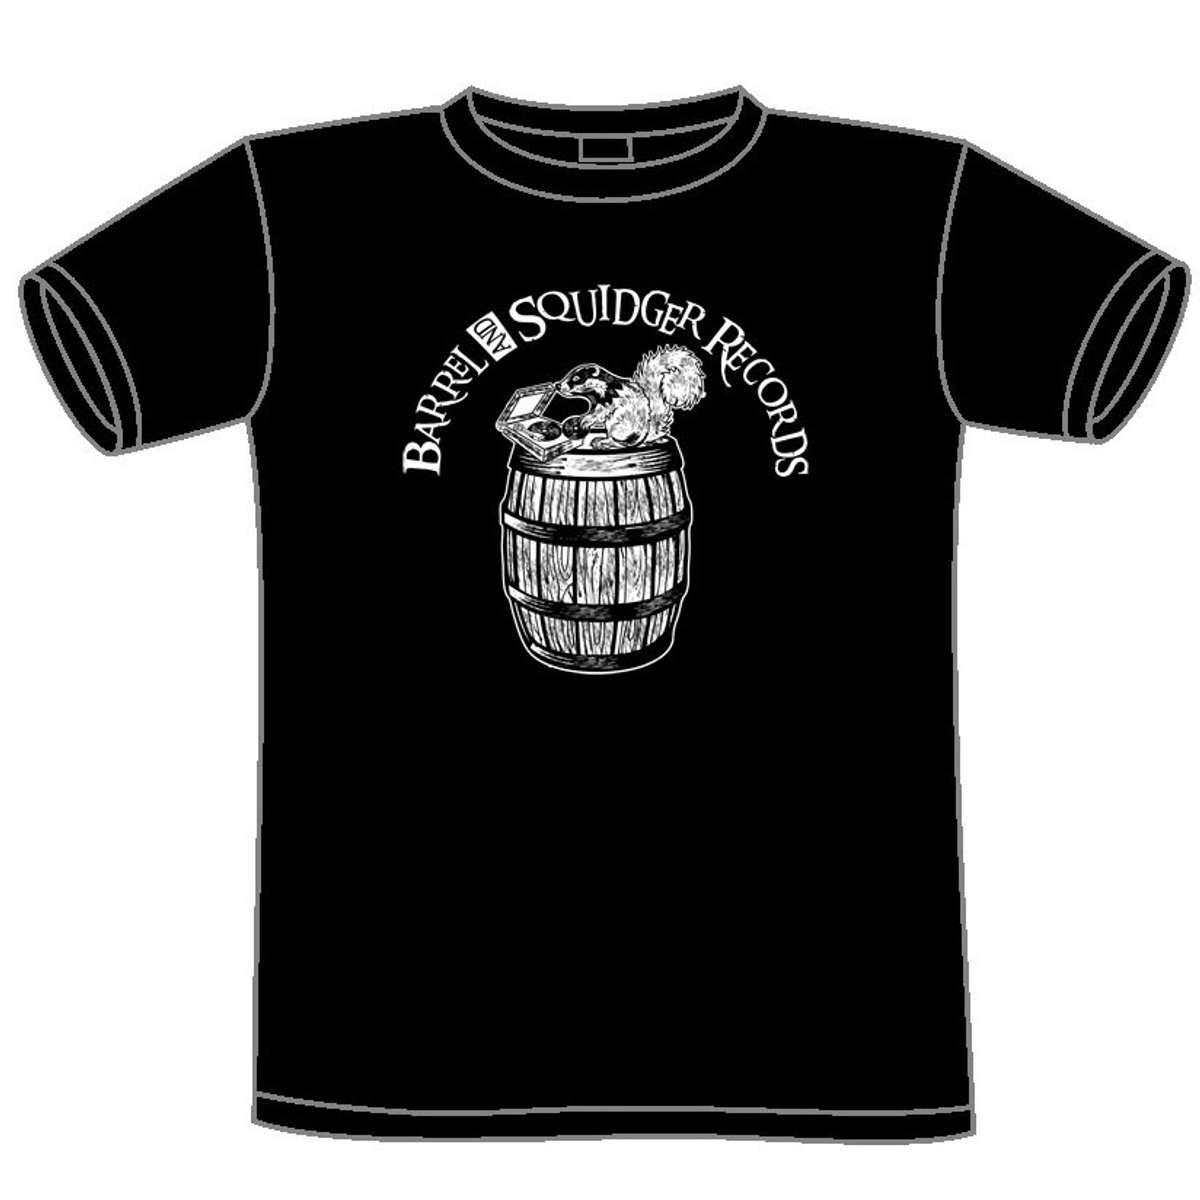 Barrel And Squidger Records - Male/Unisex T-shirt - Barrel And Squidger Records